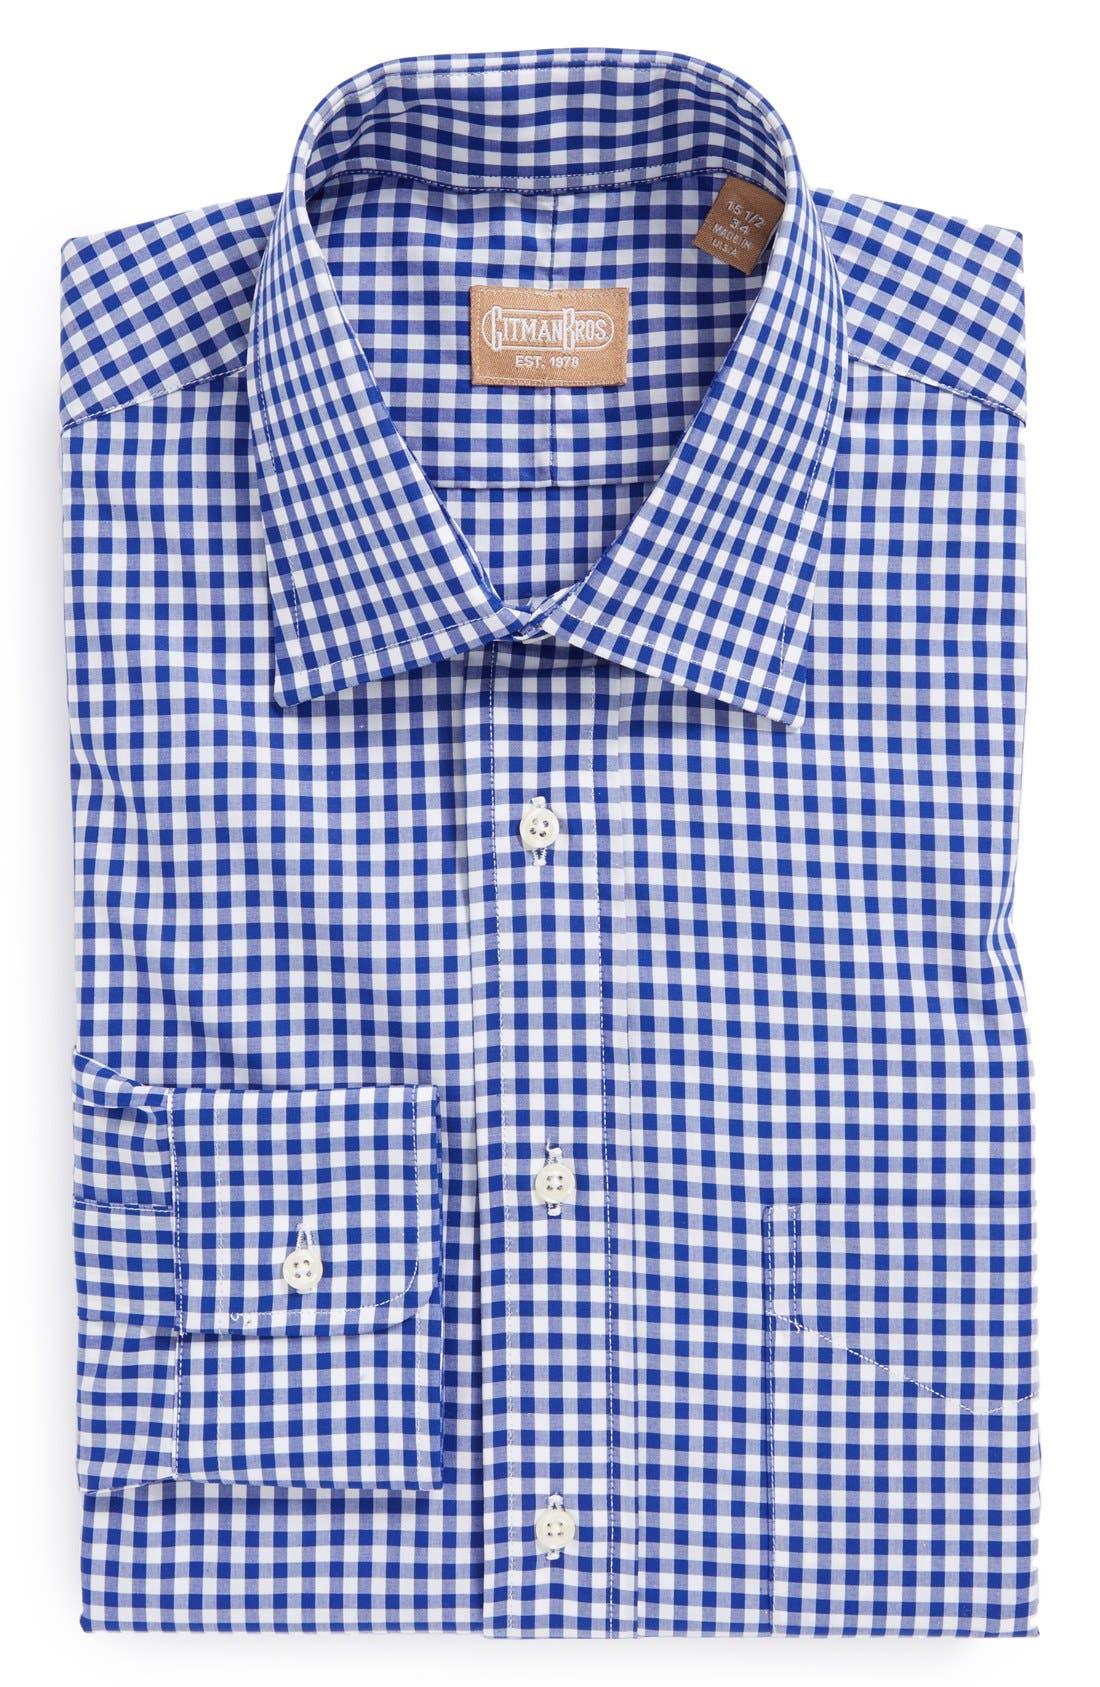 Regular Fit Cotton Gingham English Spread Collar Dress Shirt,                             Main thumbnail 1, color,                             Blue